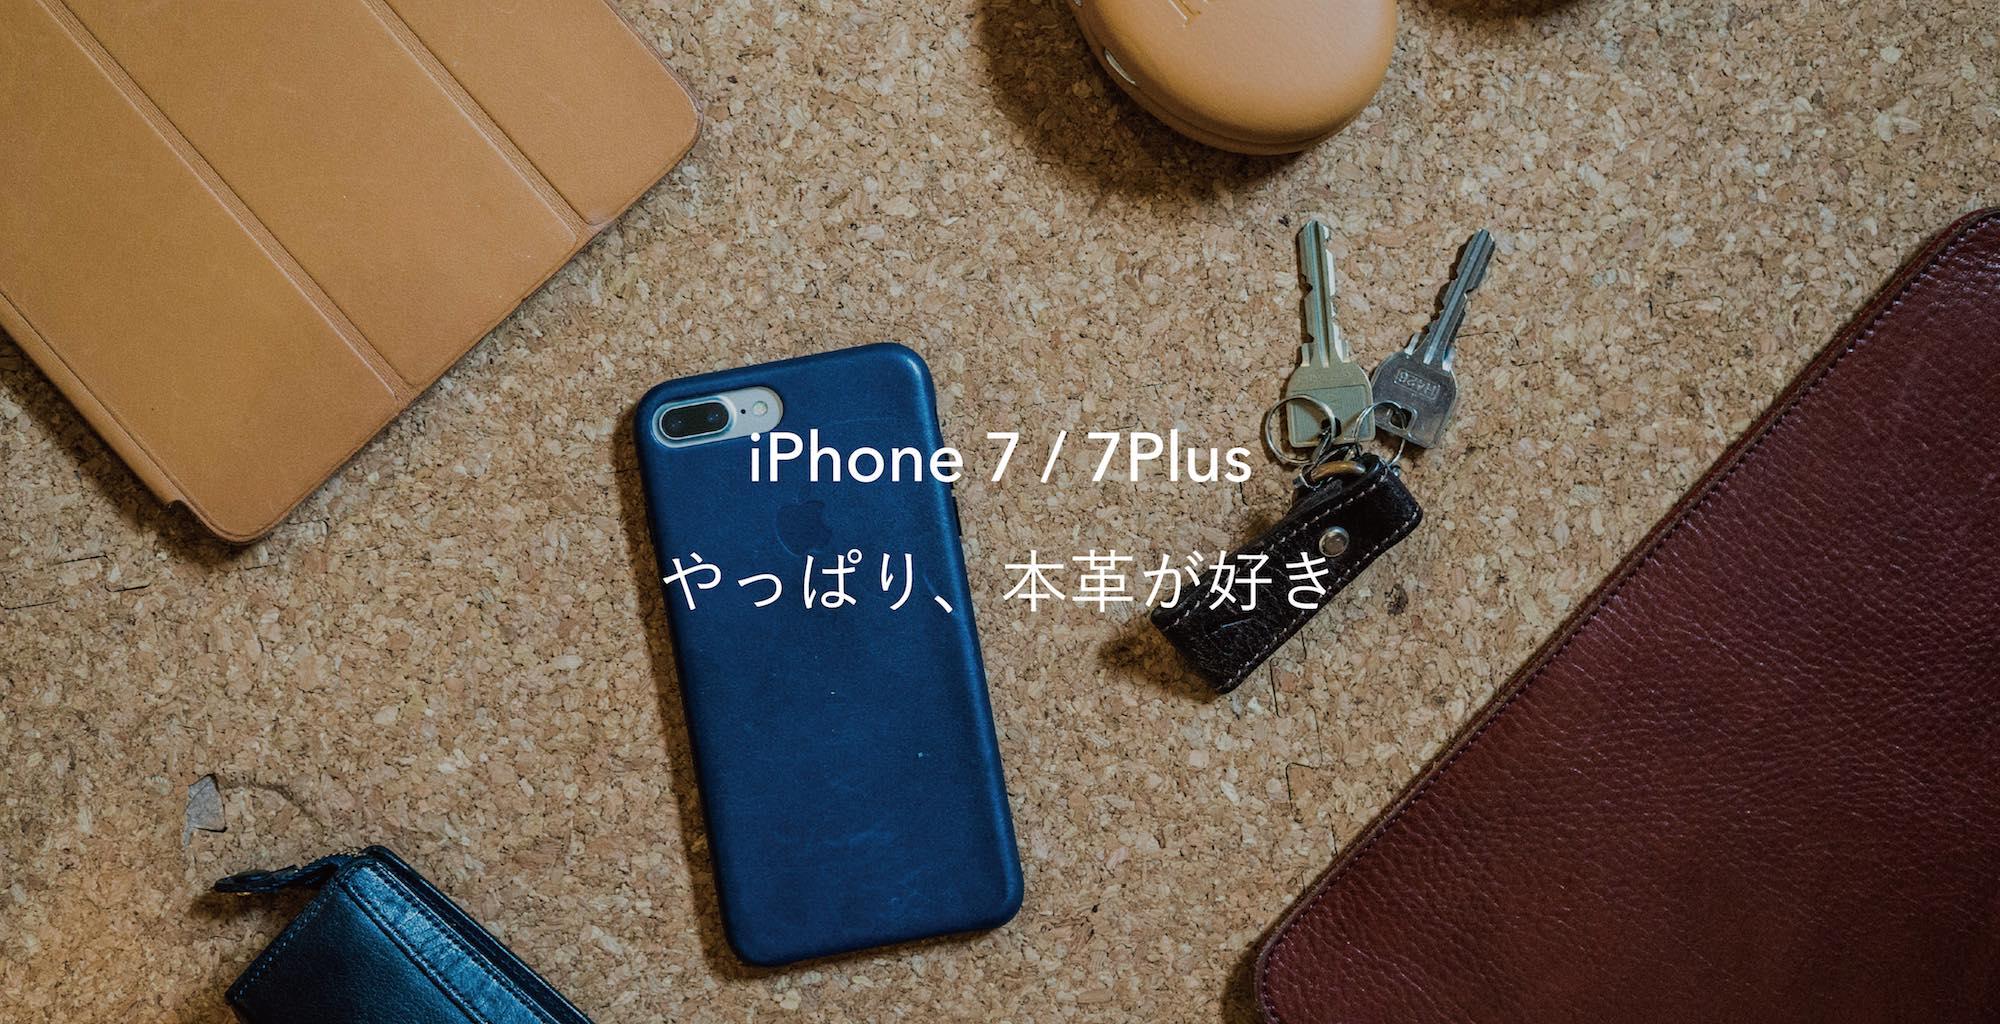 iphone7-7plus-leathercase1